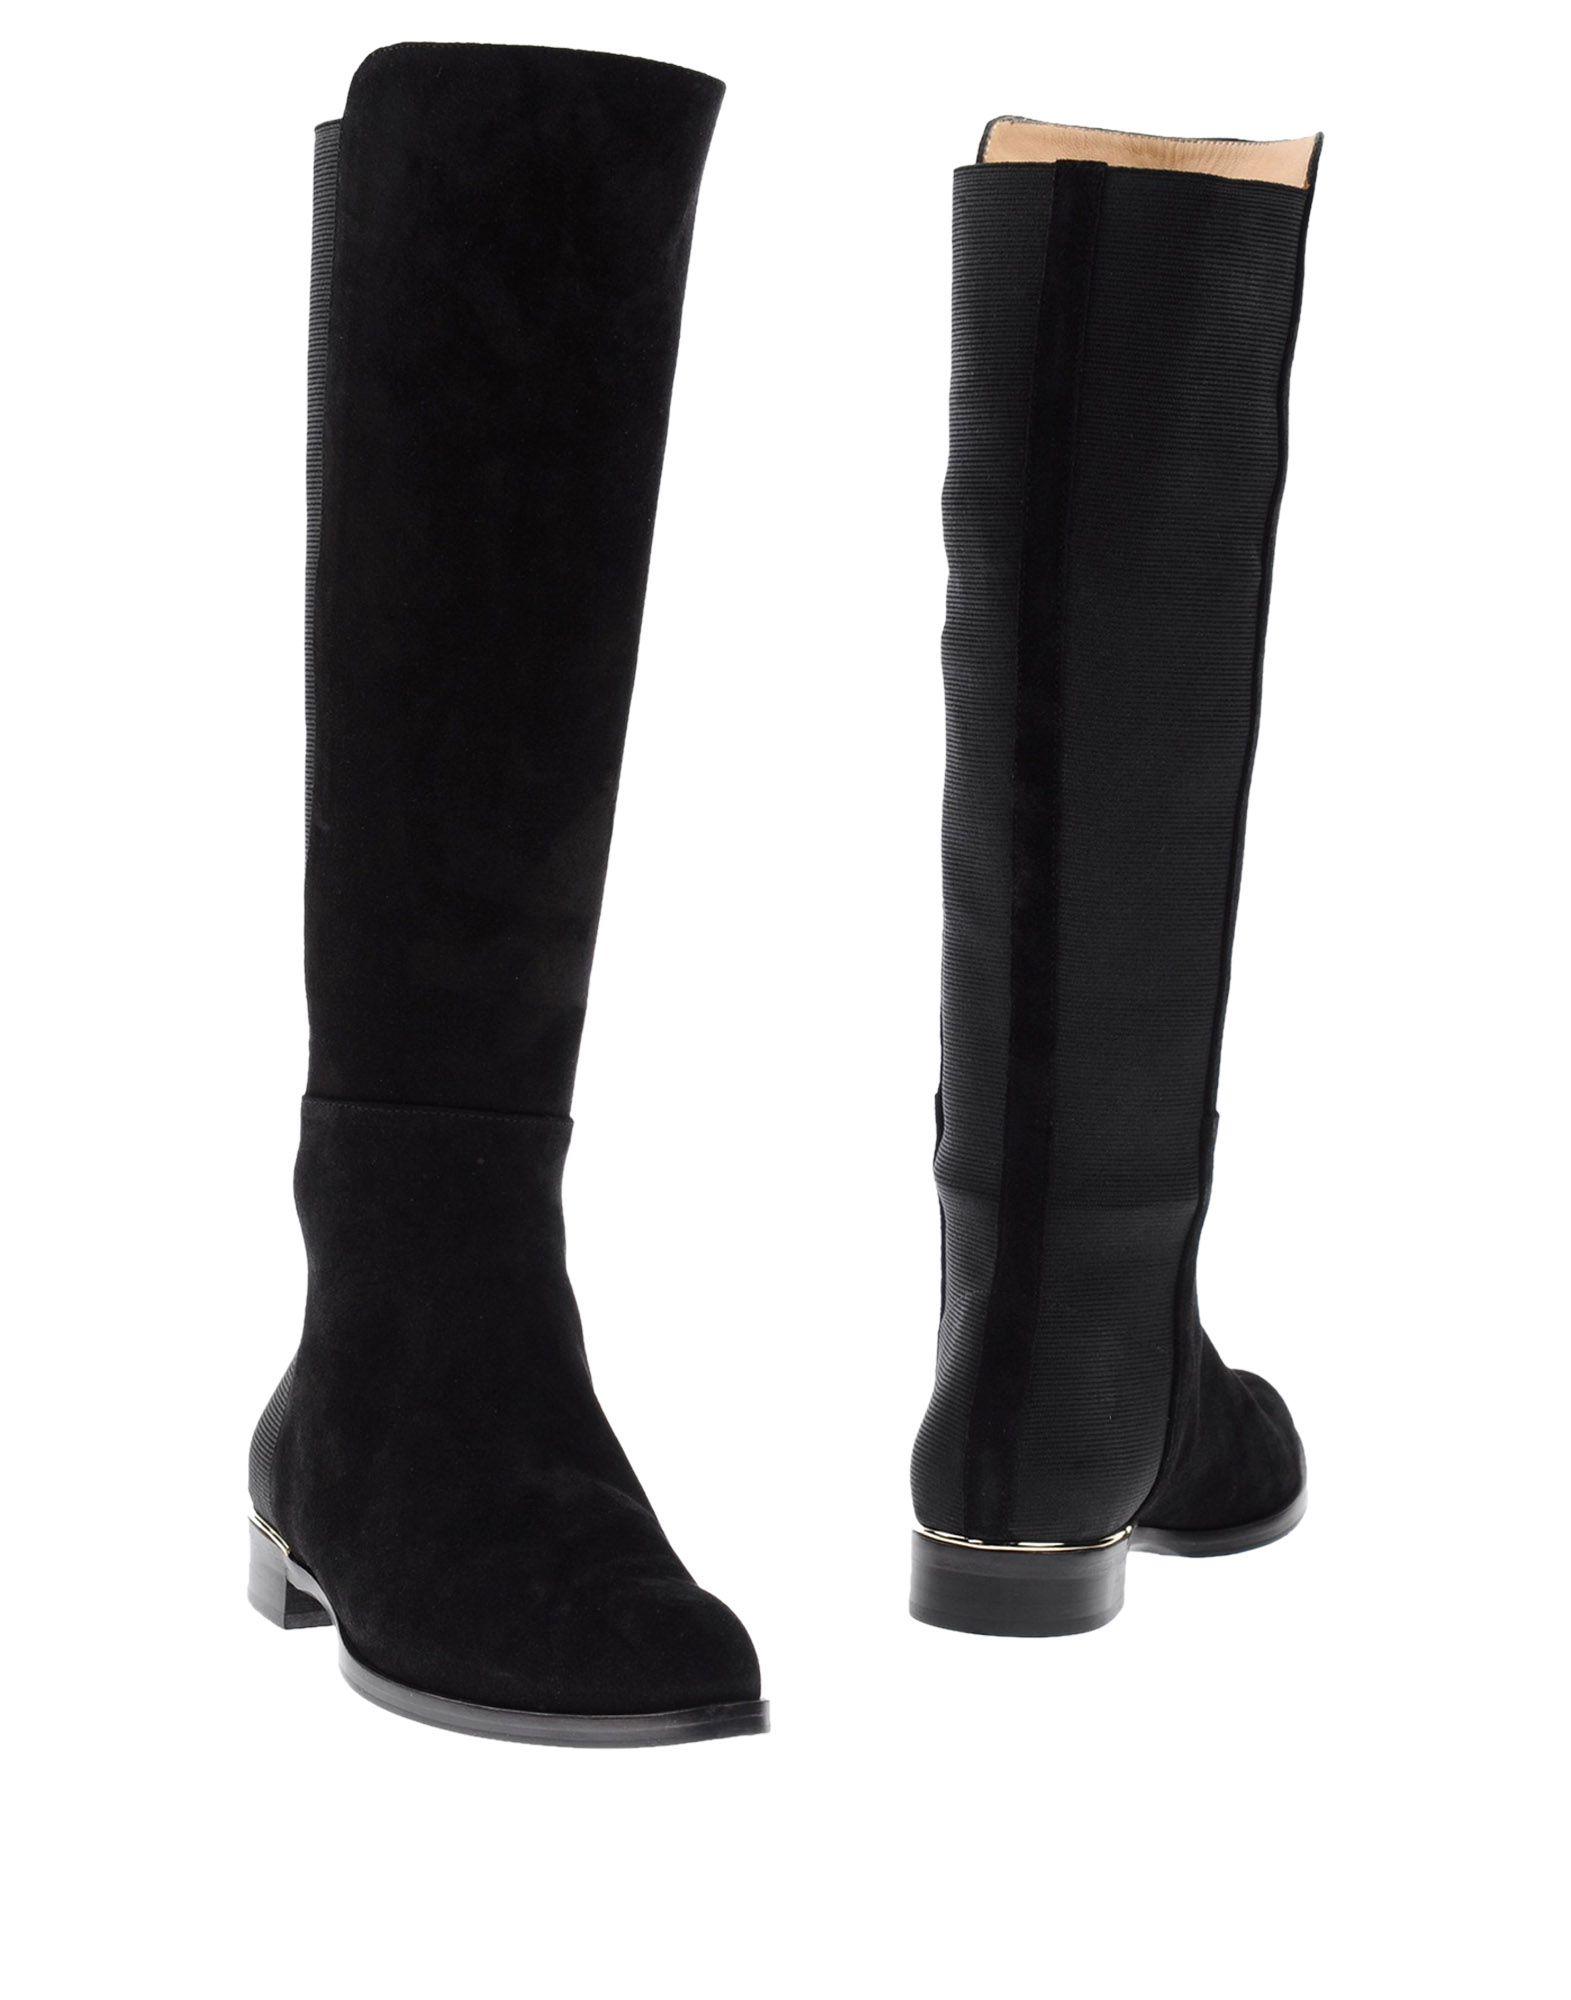 Stilvolle billige Schuhe Damen Roberto Festa Stiefel Damen Schuhe  11029747SF ce1e62